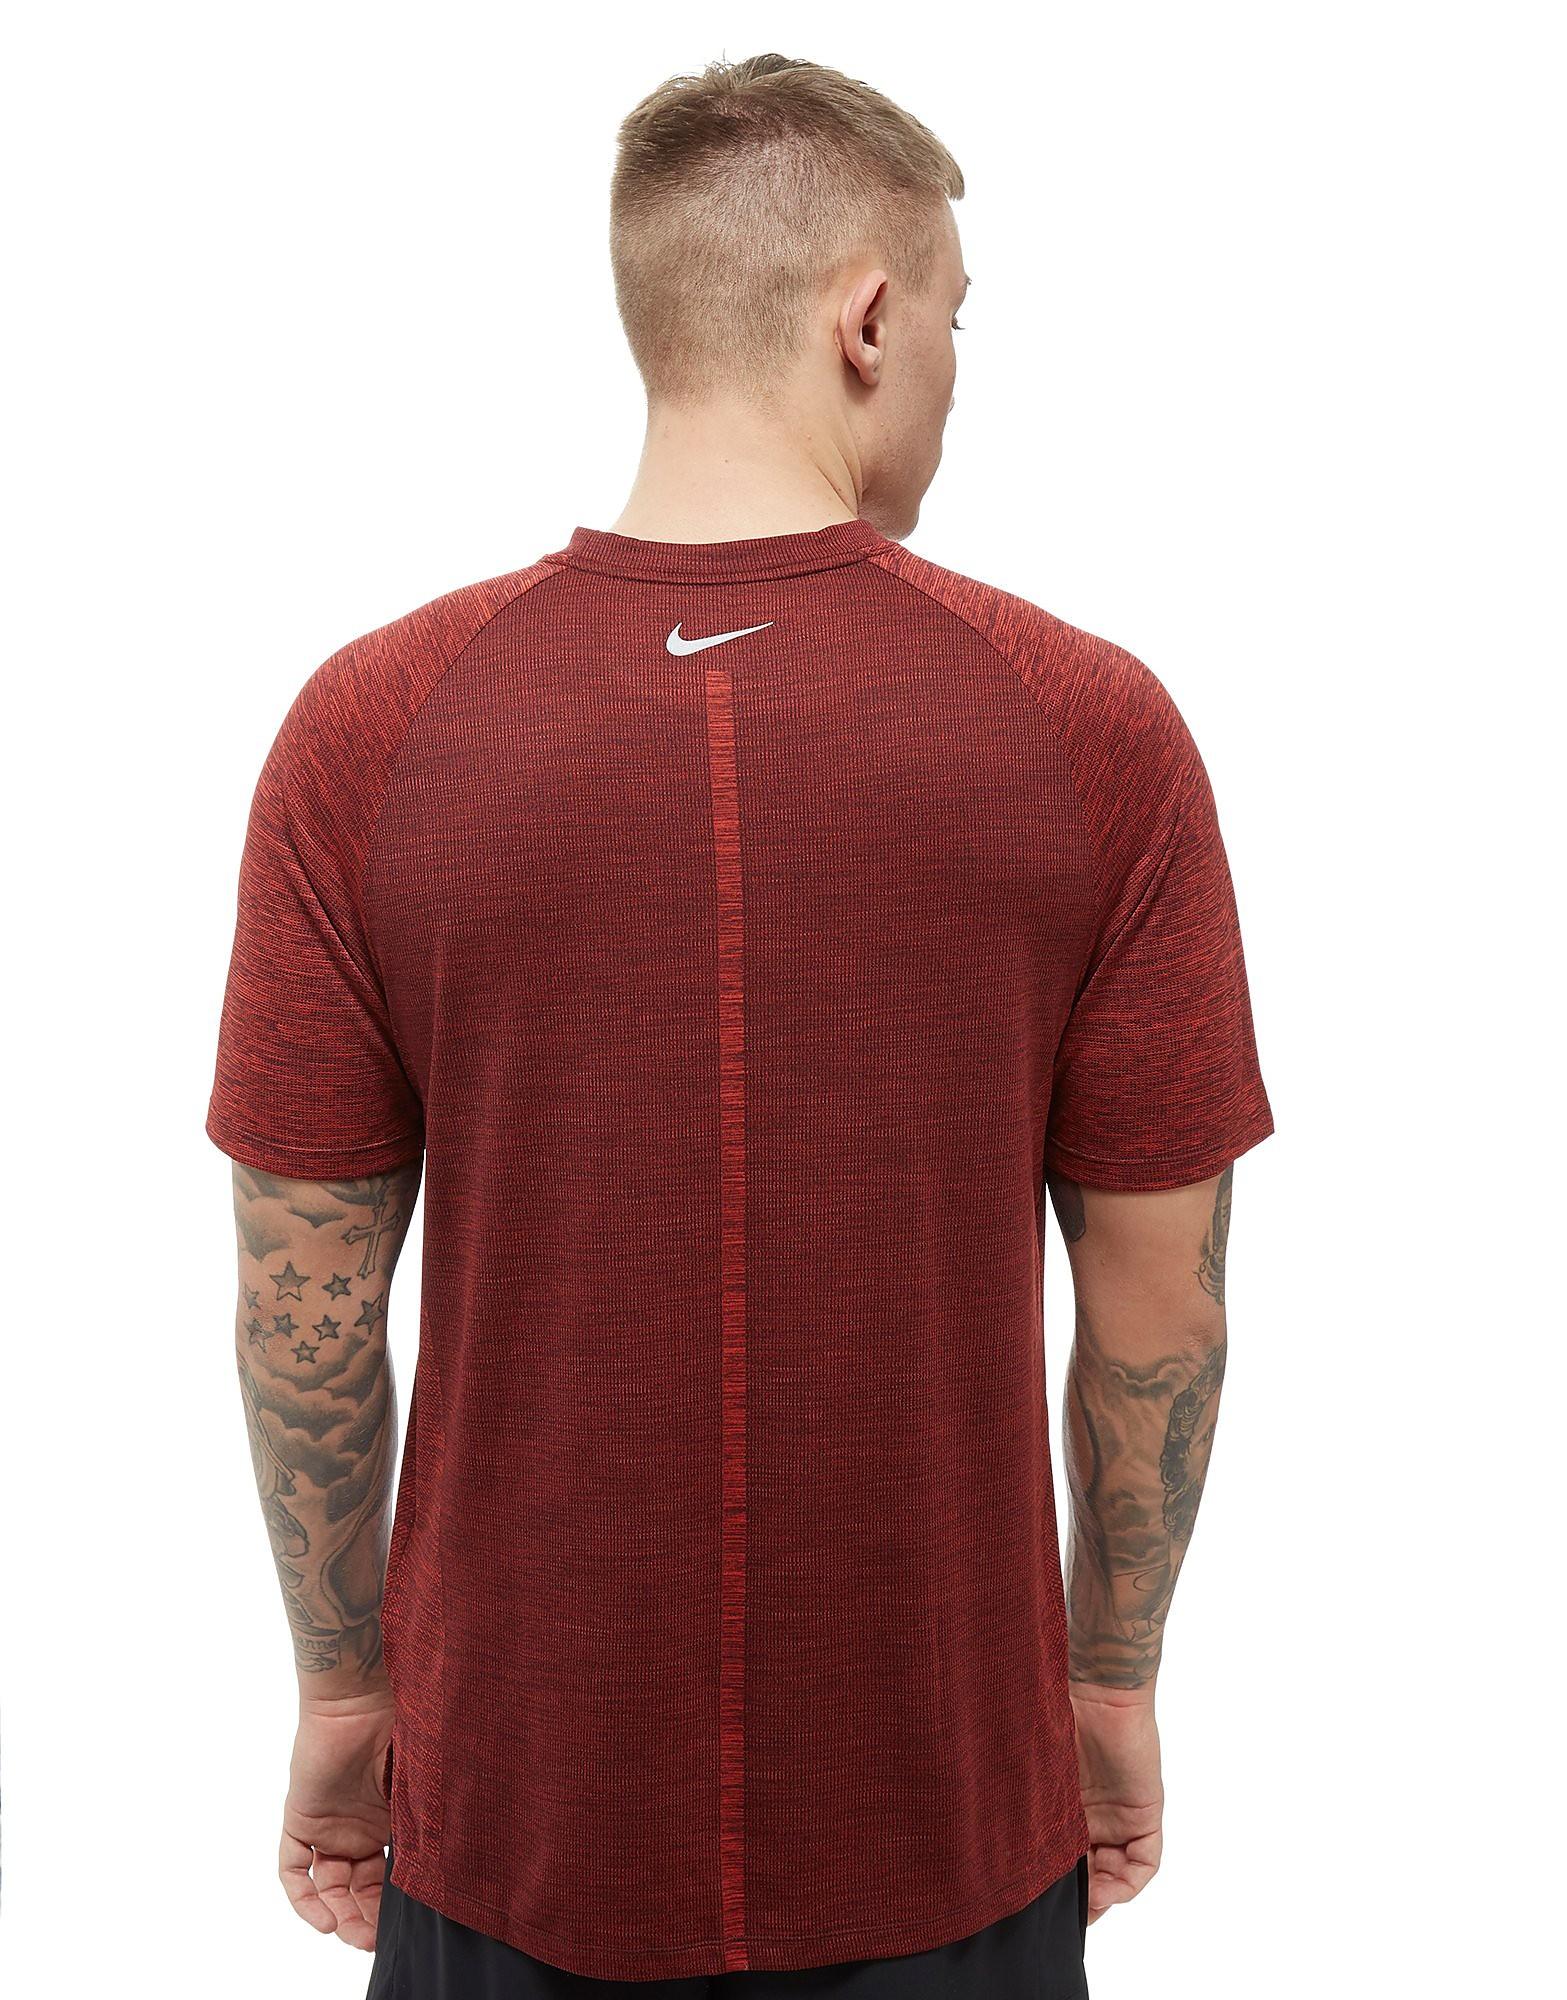 Nike Dry Medalist Short Sleeve T-Shirt